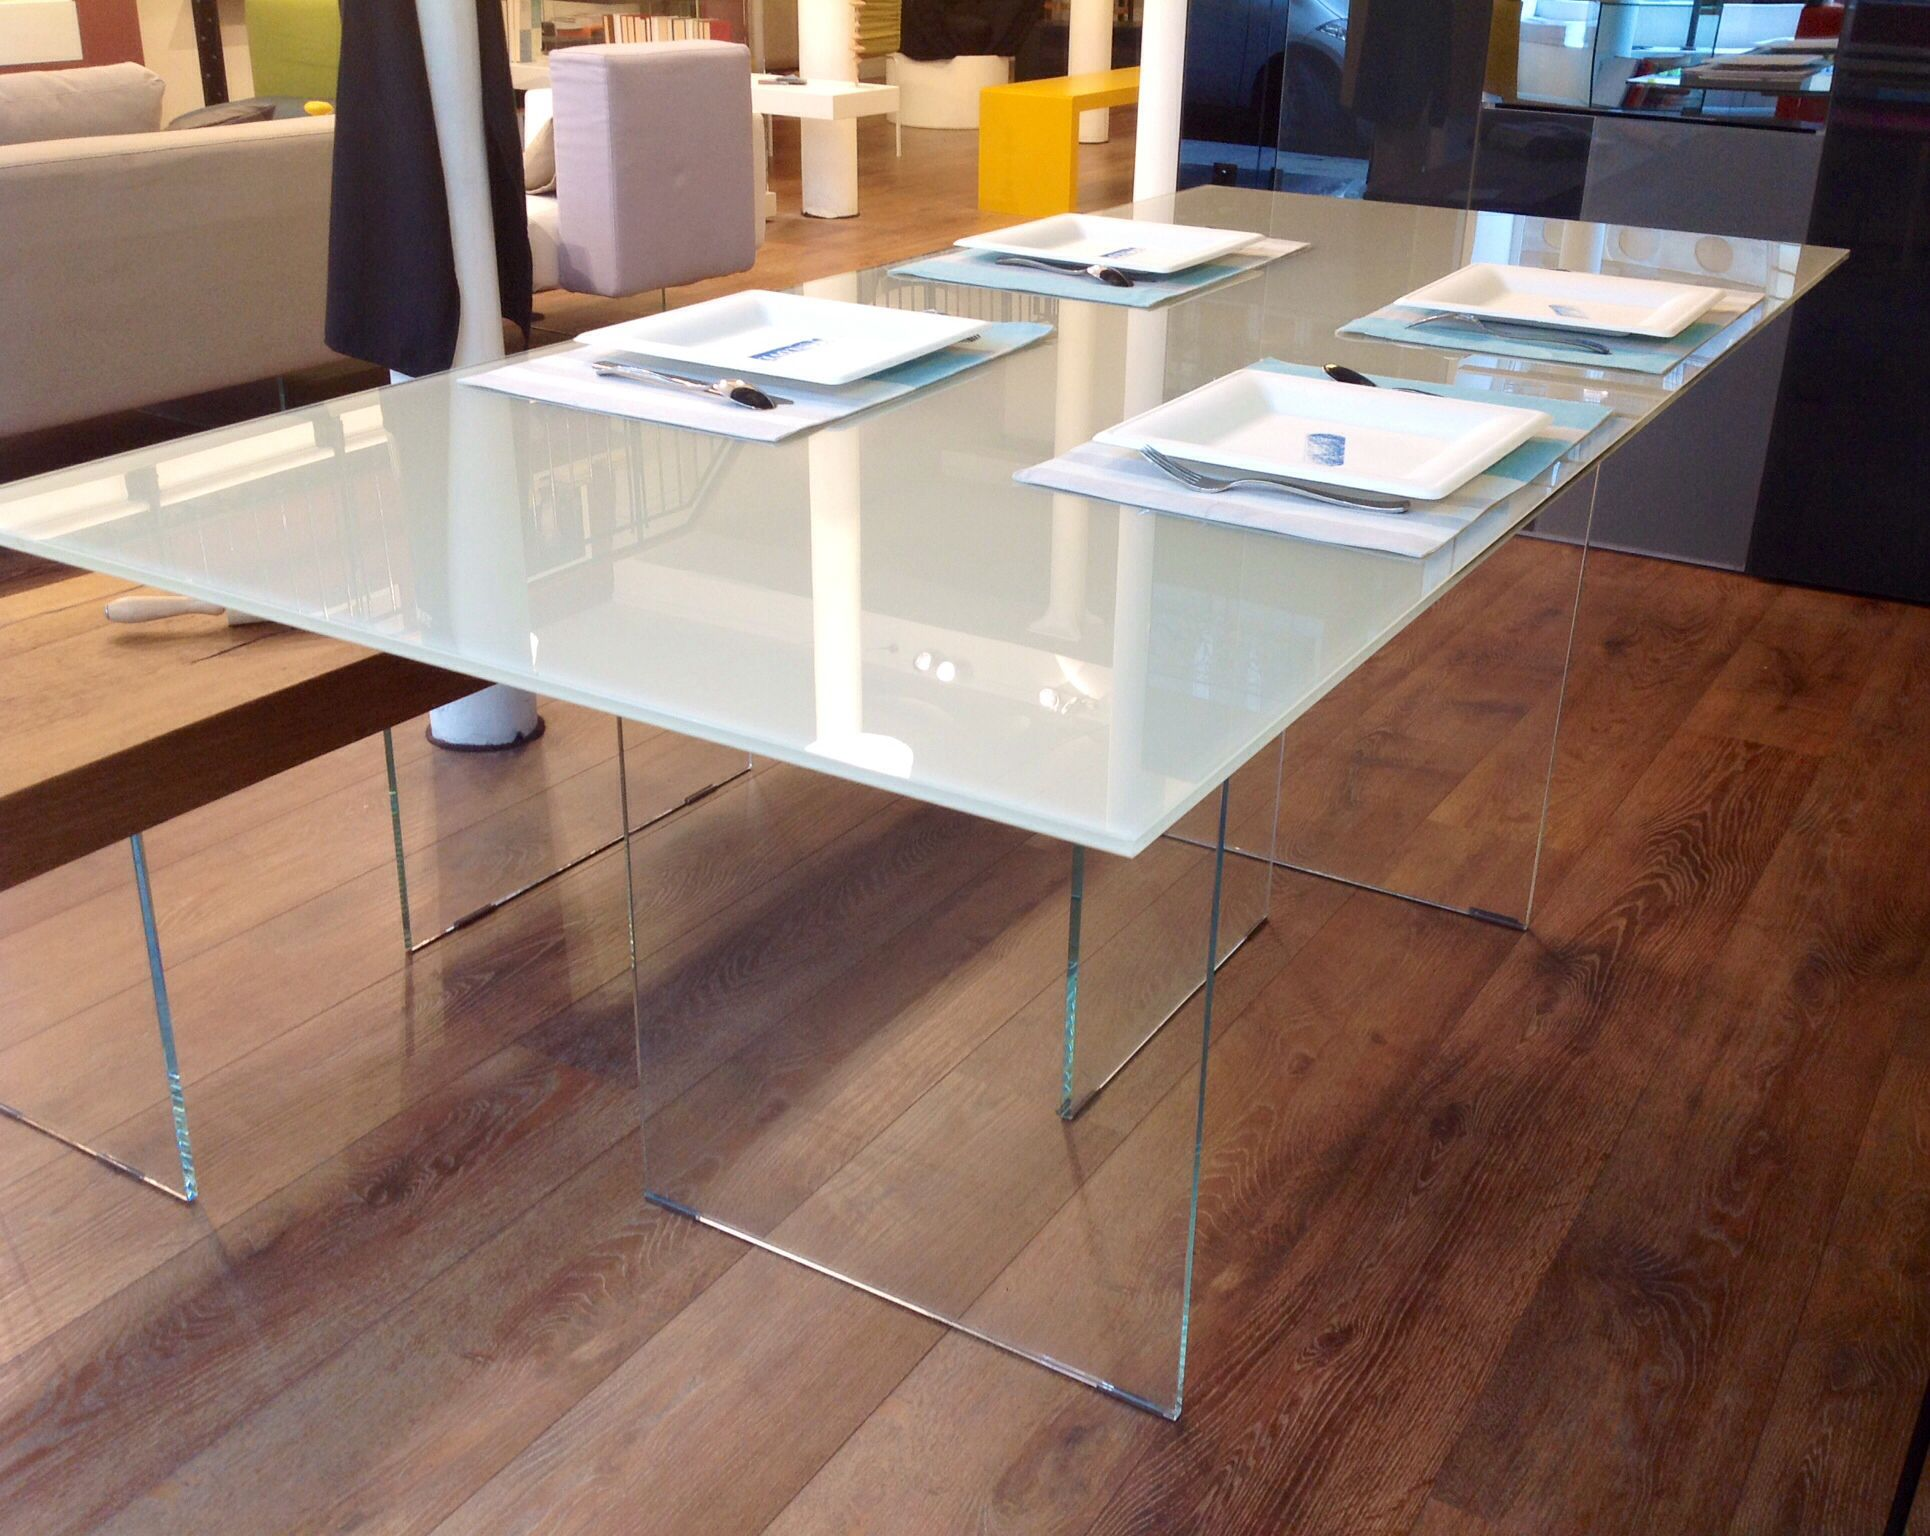 Lago Tavolo ~ Air table by lago design by daniele lago interior design